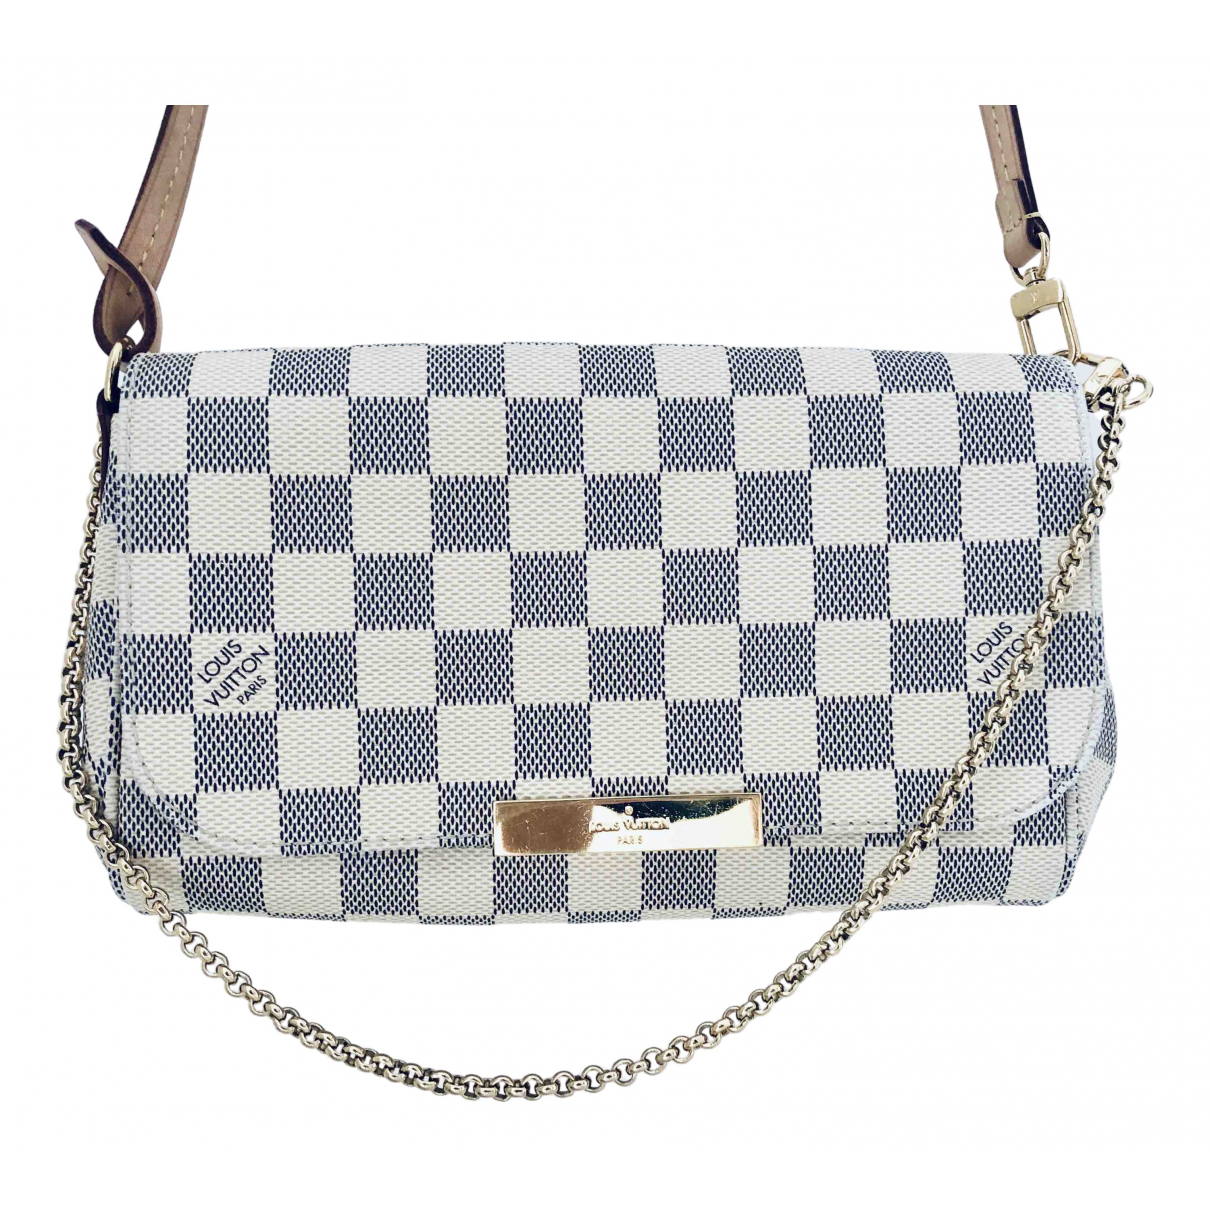 Bandolera Favorite de Lona Louis Vuitton